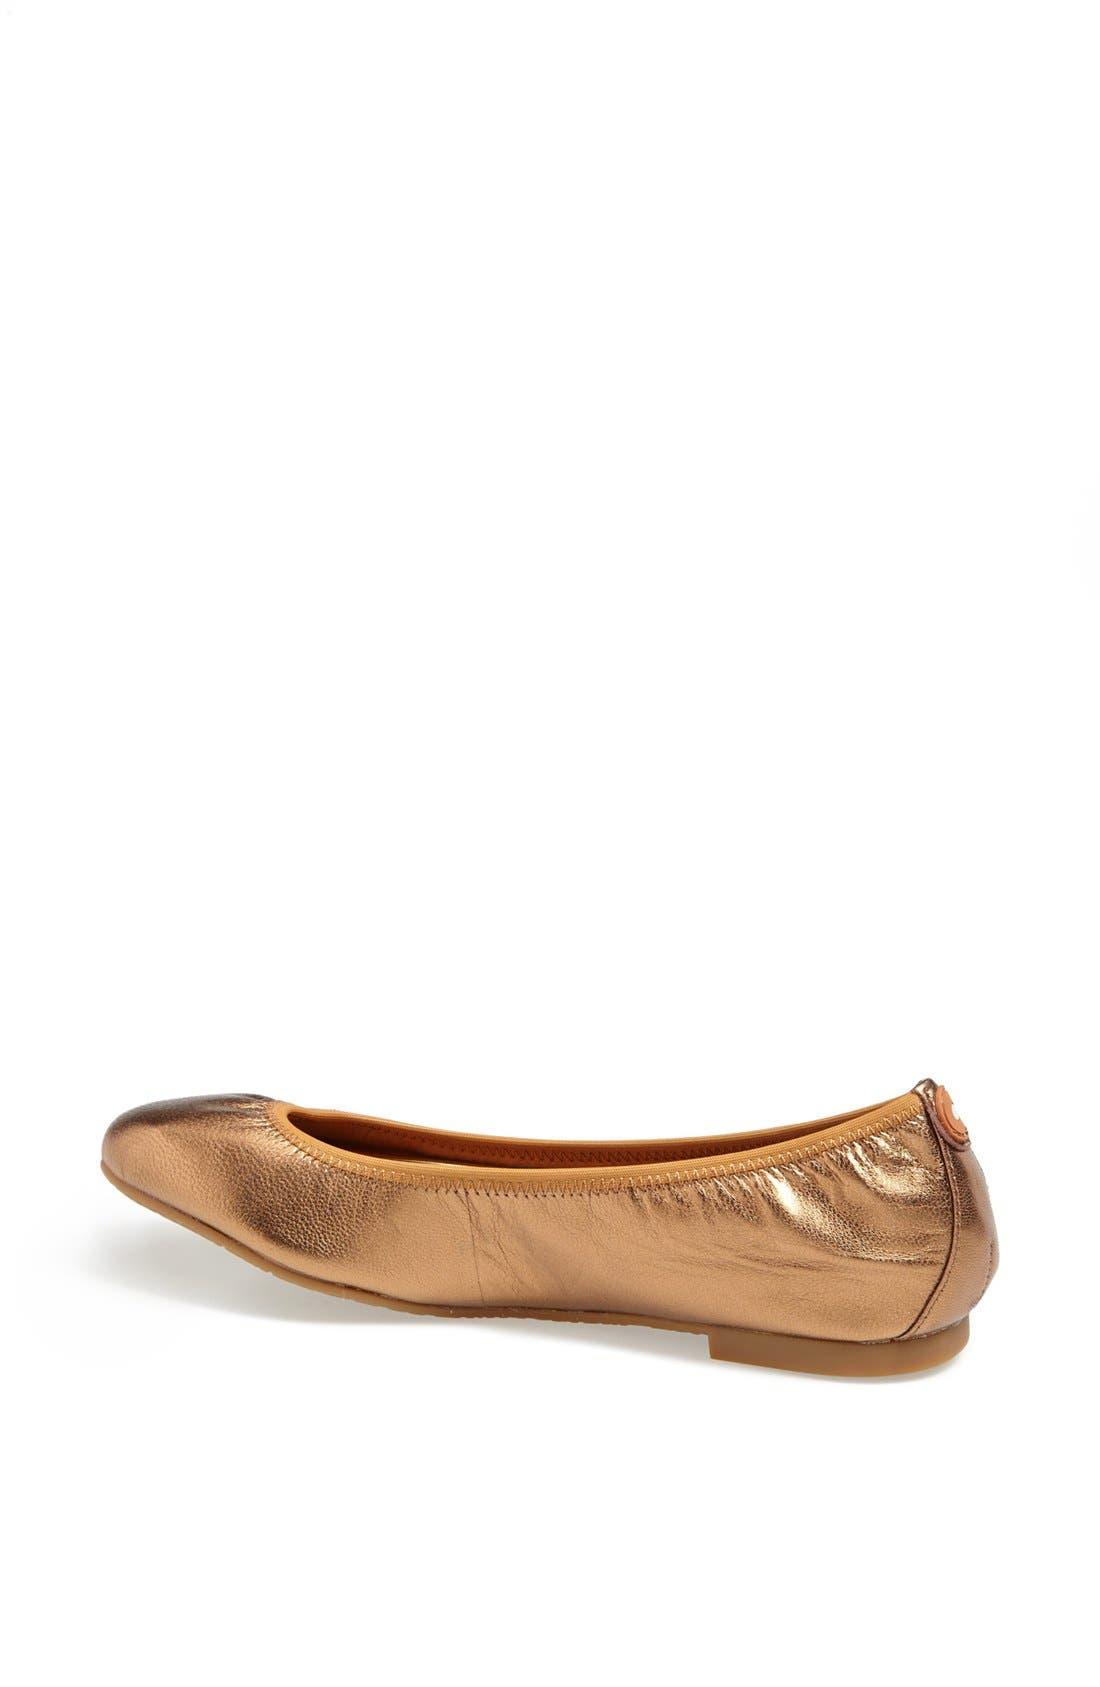 Alternate Image 2  - Juil 'The Flat' Earthing Metallic Leather Ballet Flat